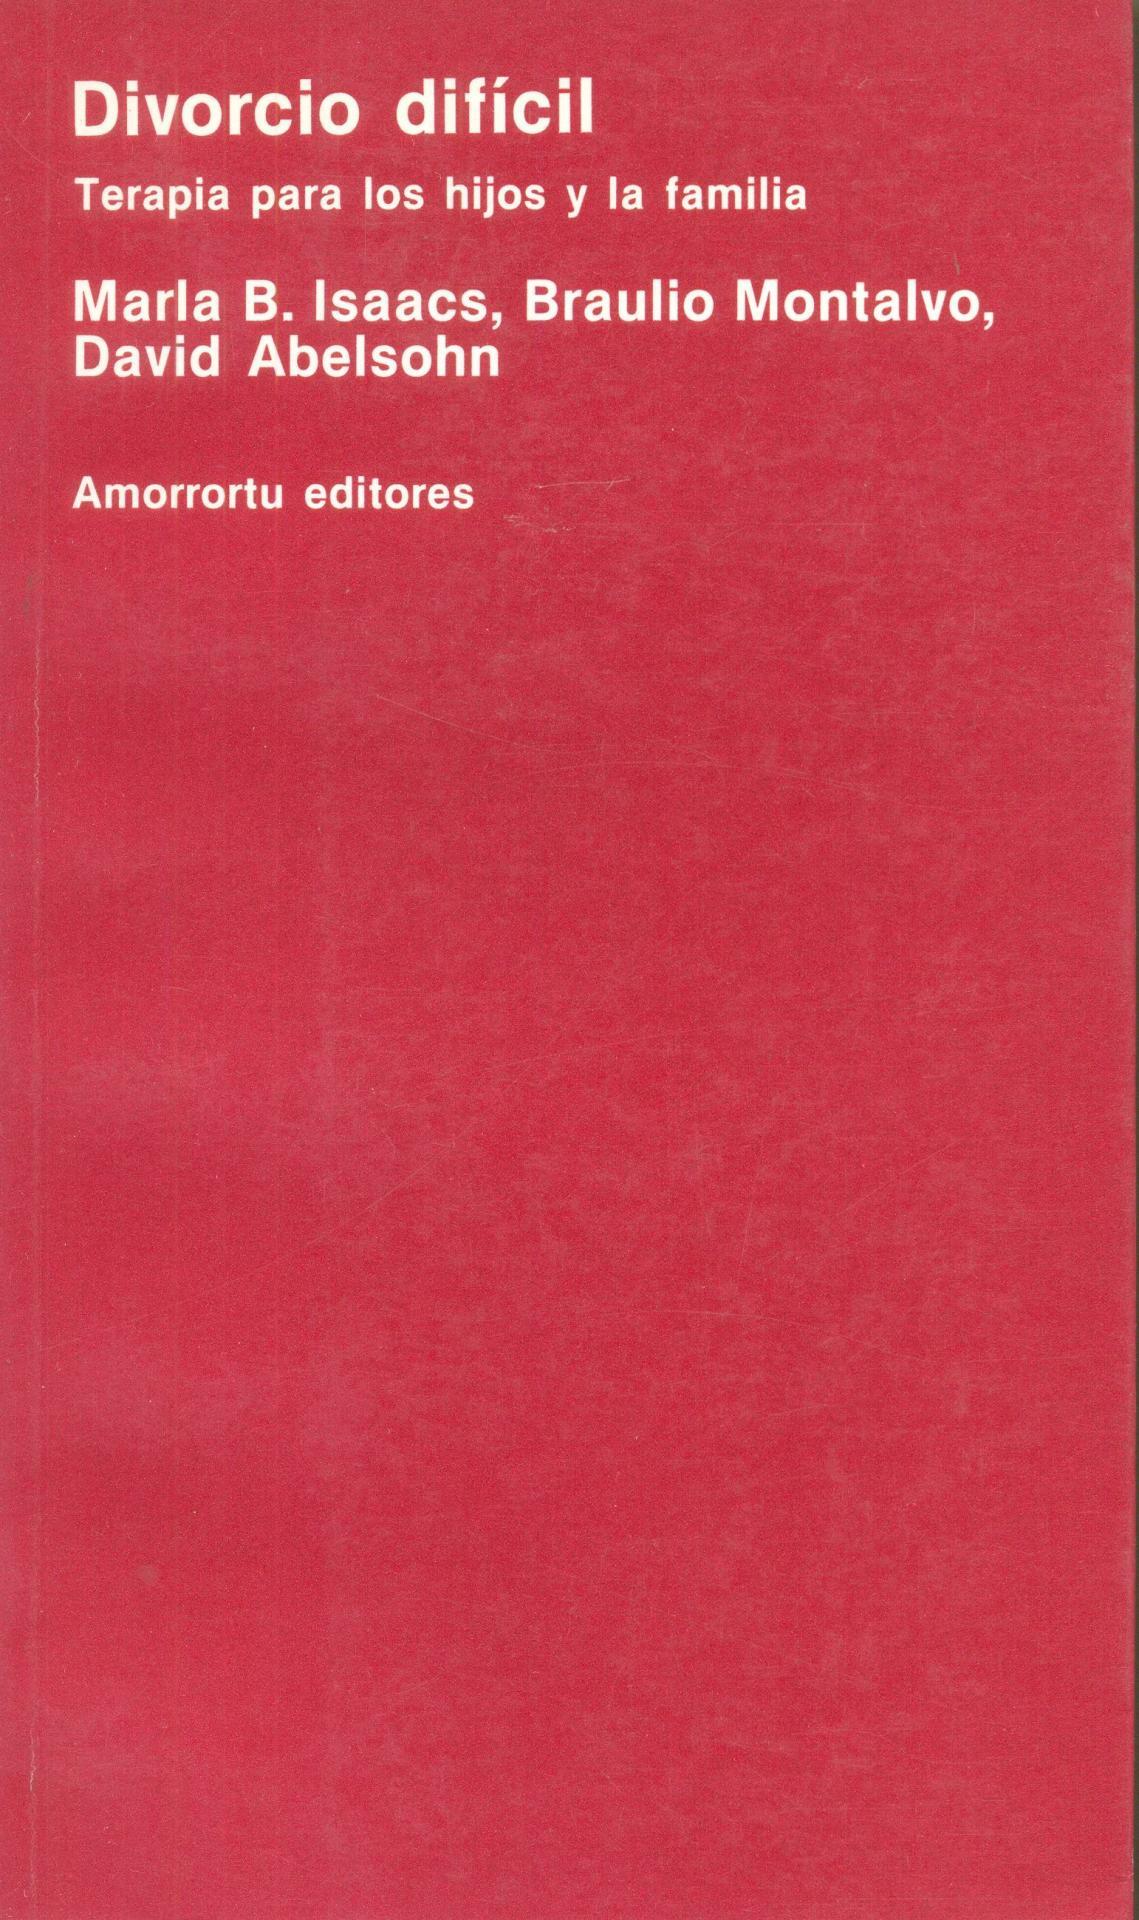 DIVORCIO DIFÍCIL. Terapia para los hijos y la familia. Isaacs, M.B.; Montalvo, B.; Abelsohn, D.